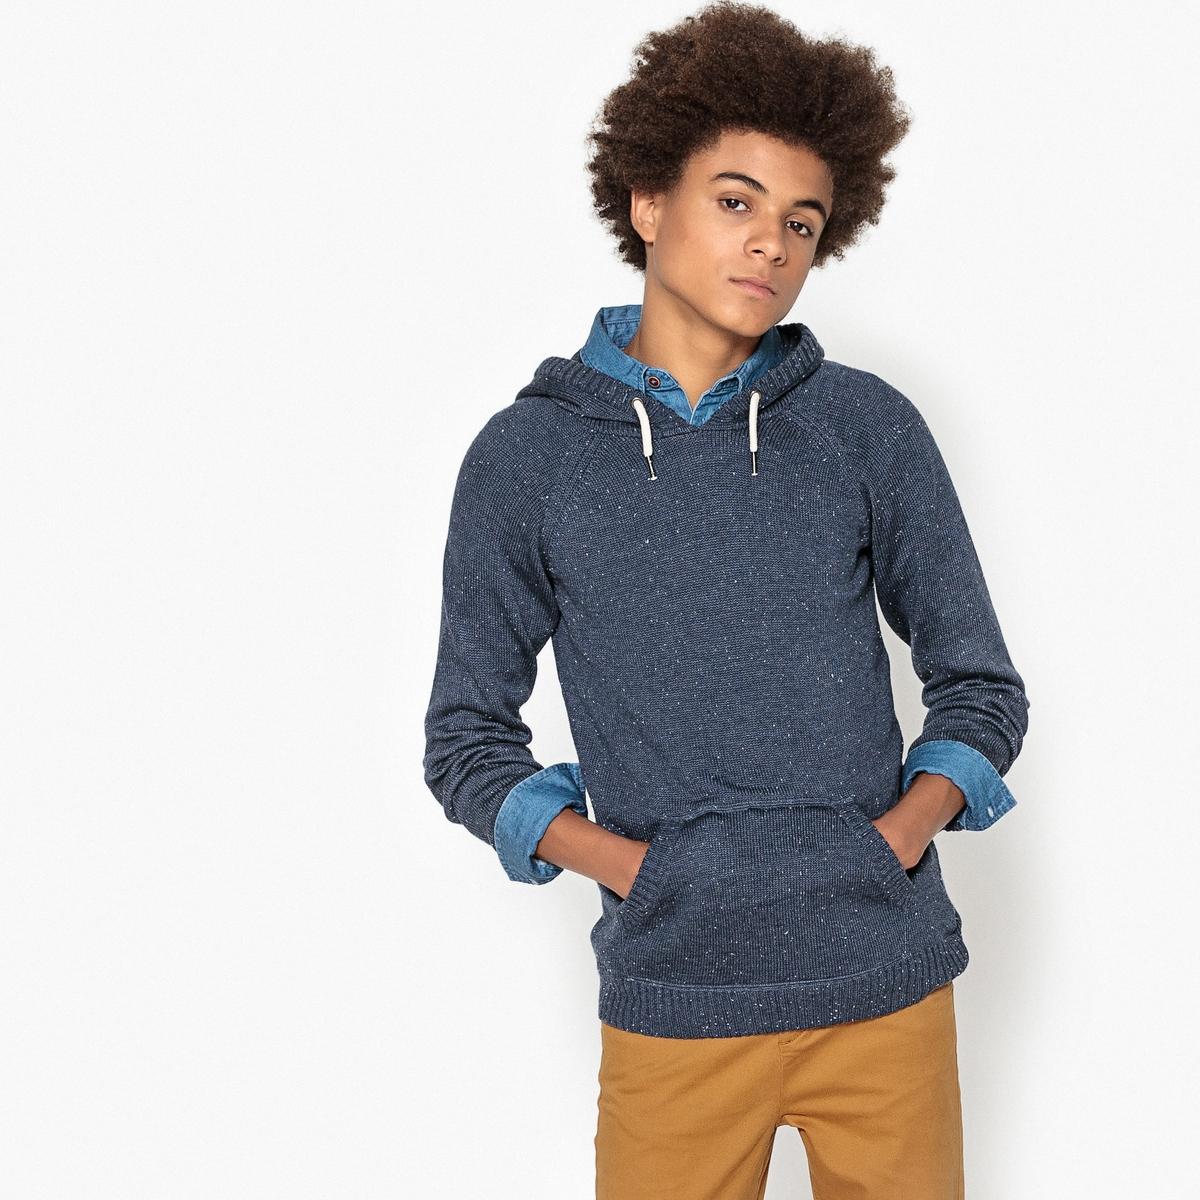 Пуловер из тонкого трикотажа с капюшоном